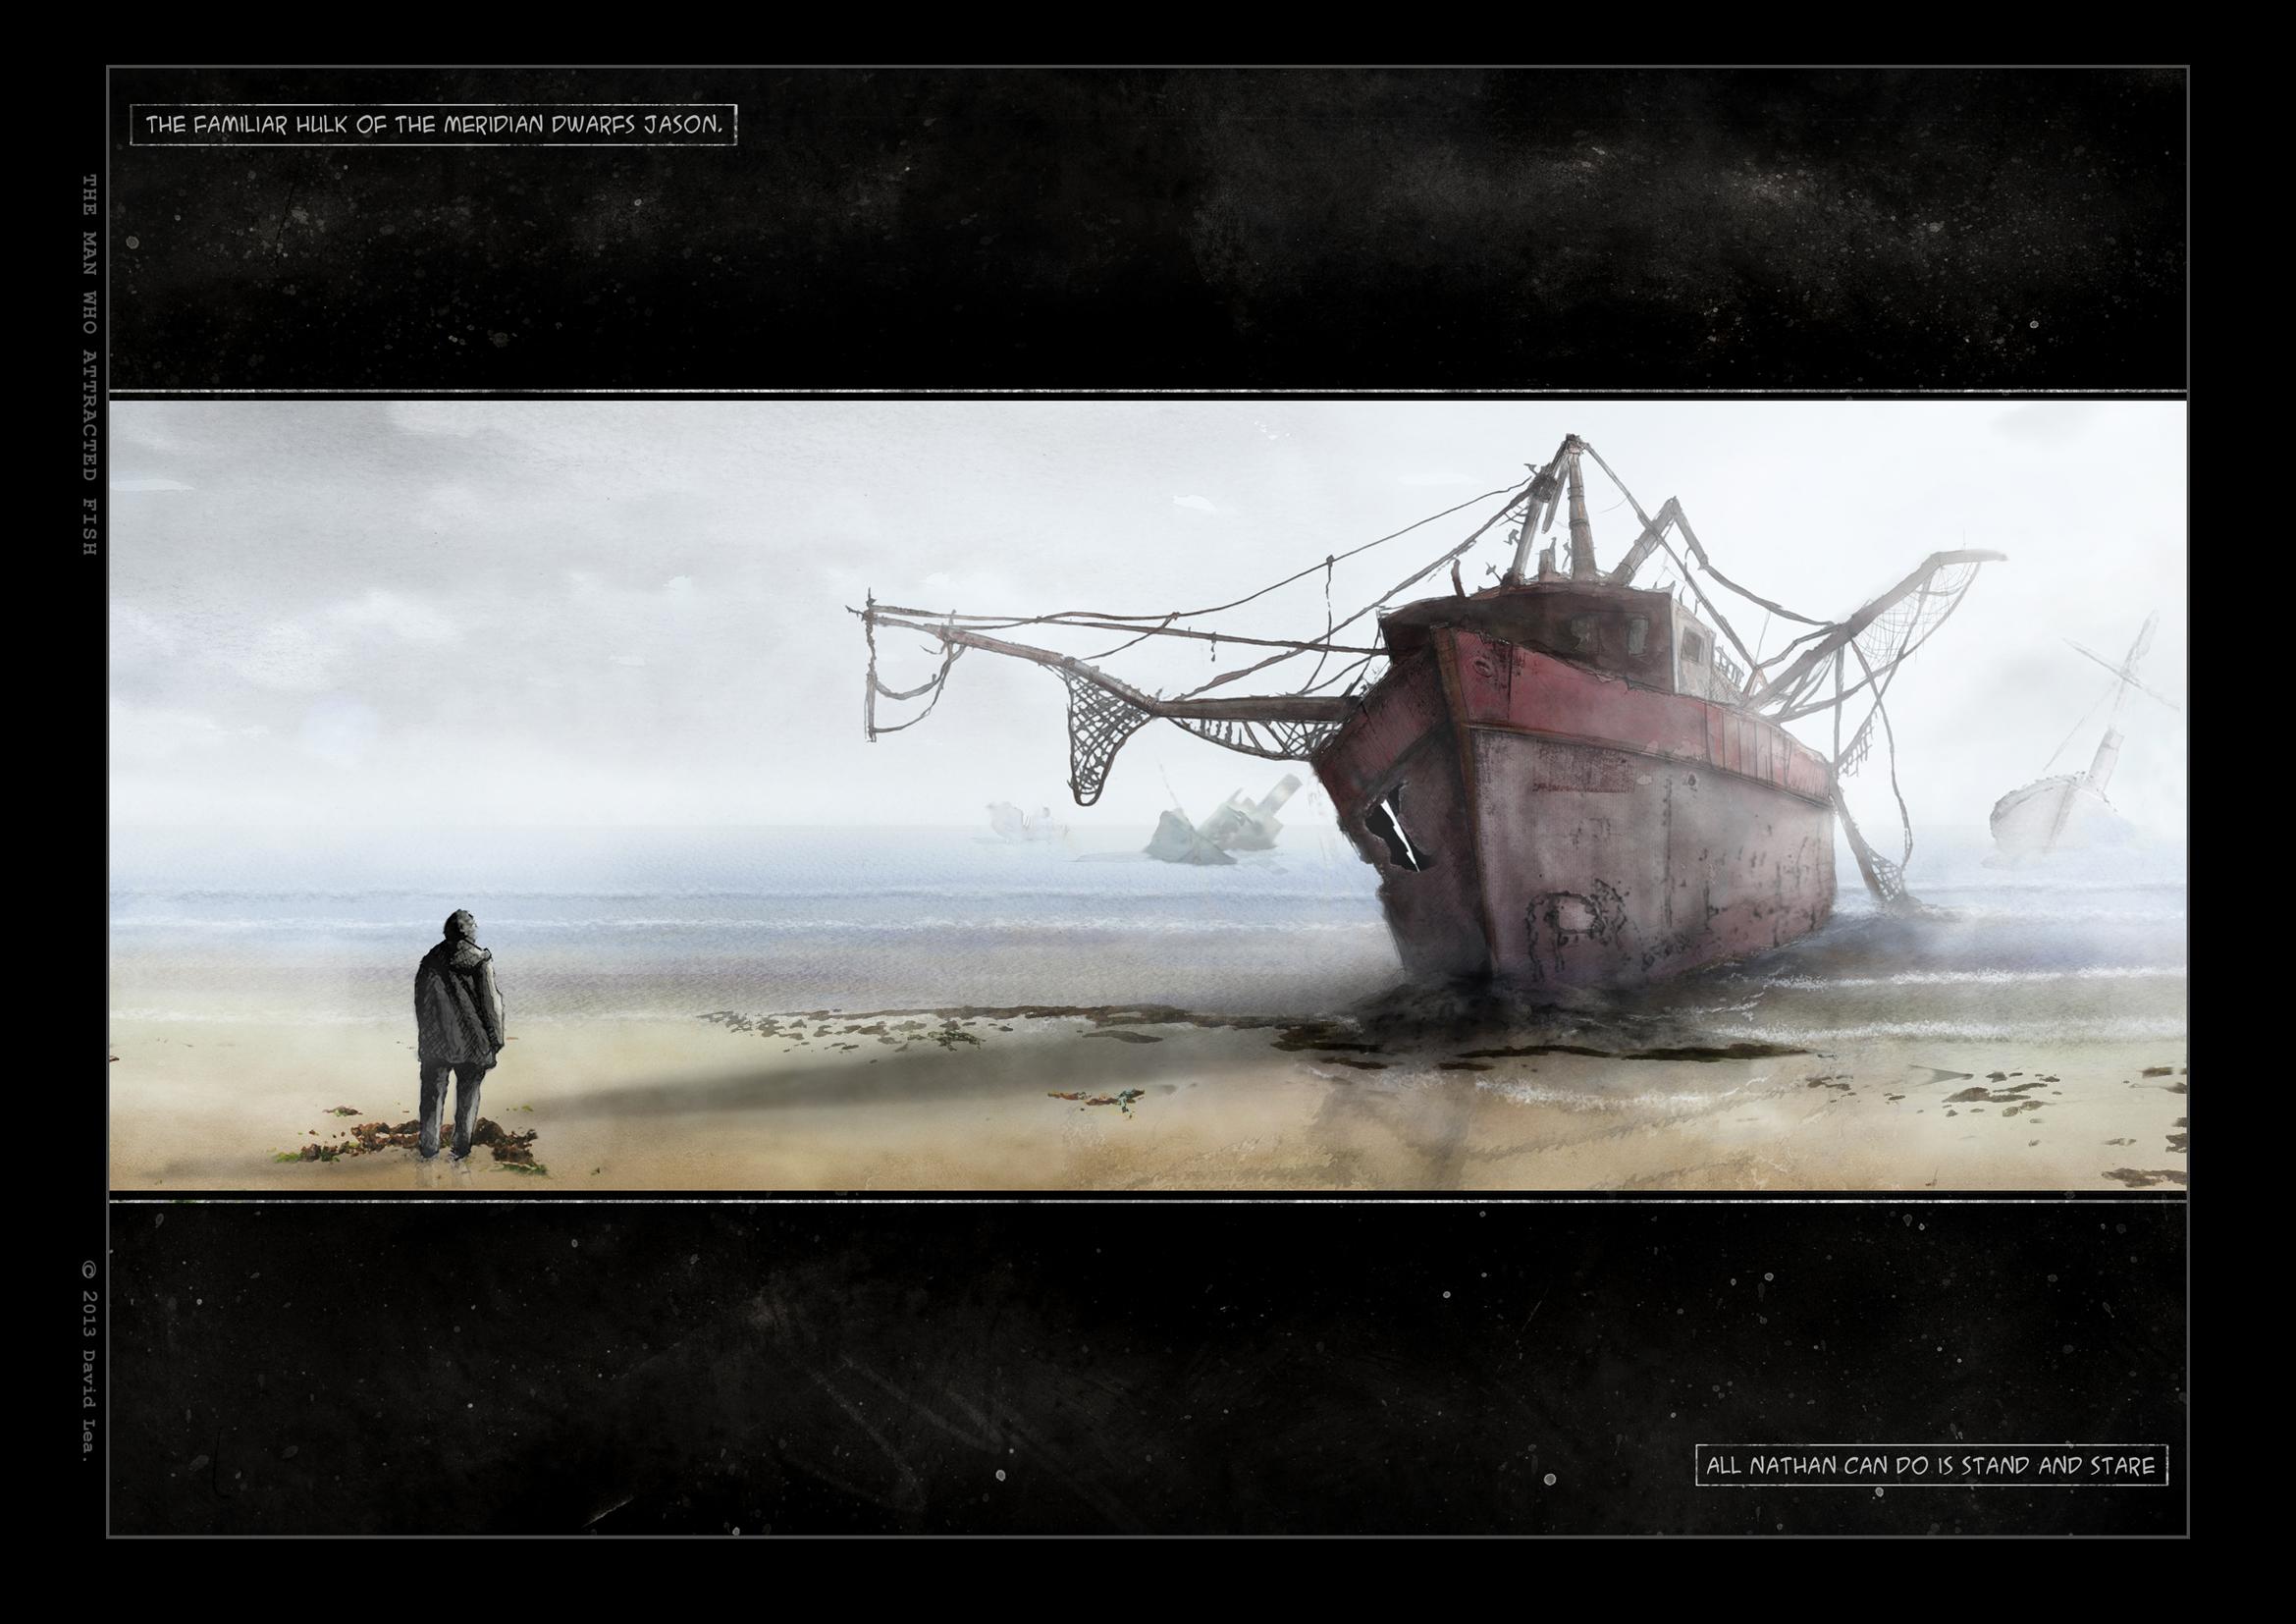 TMWAF_Graphic novel scene - page 8